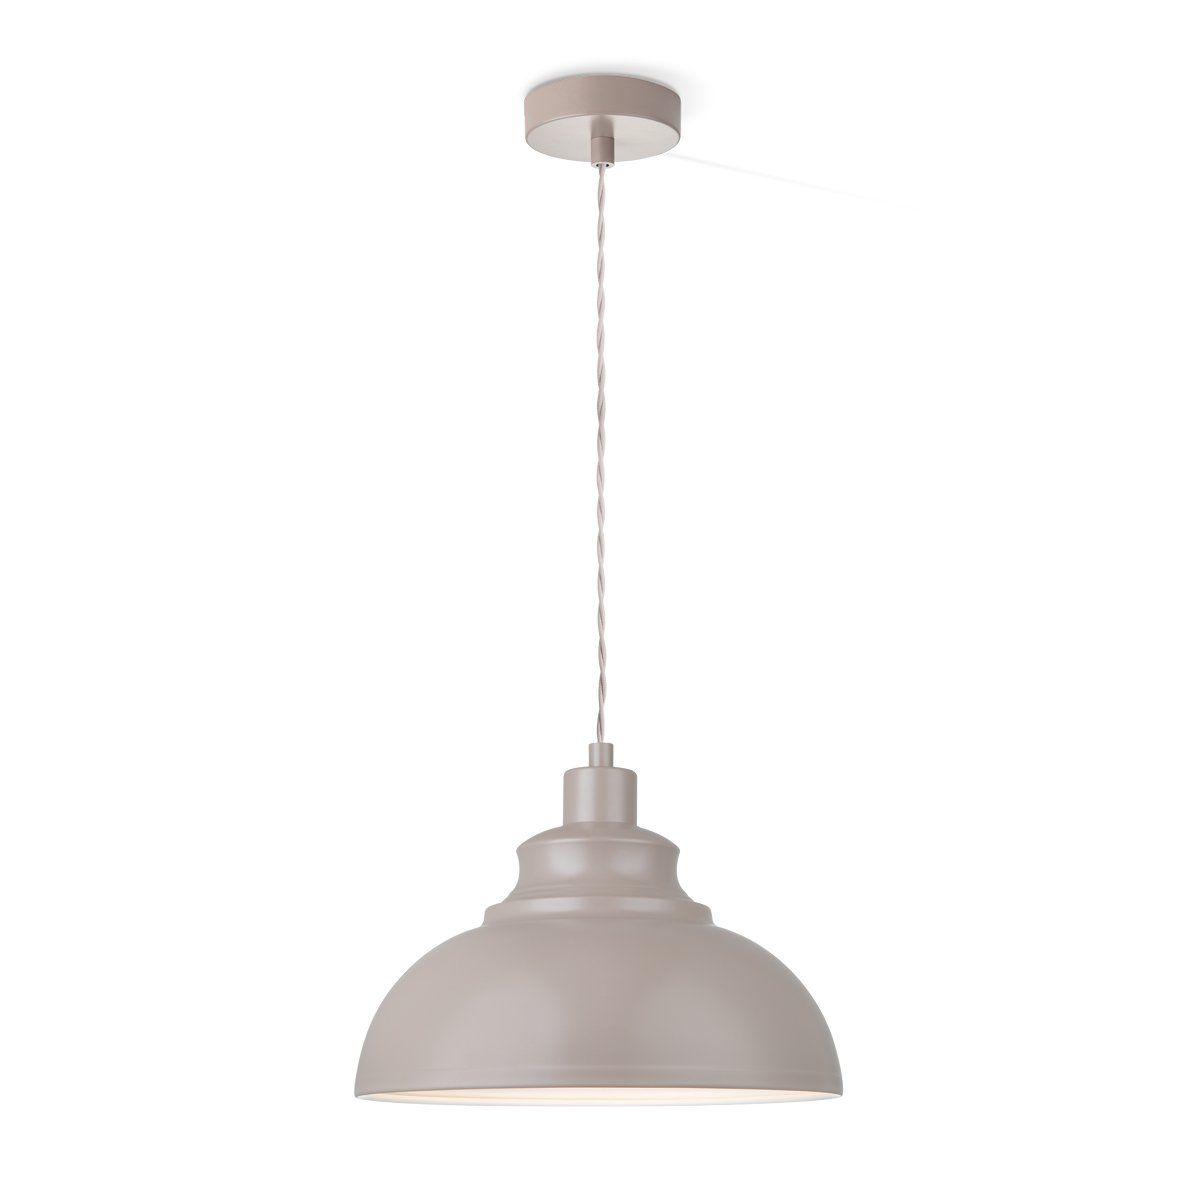 Home sweet home hanglamp Takis 29 - bruin